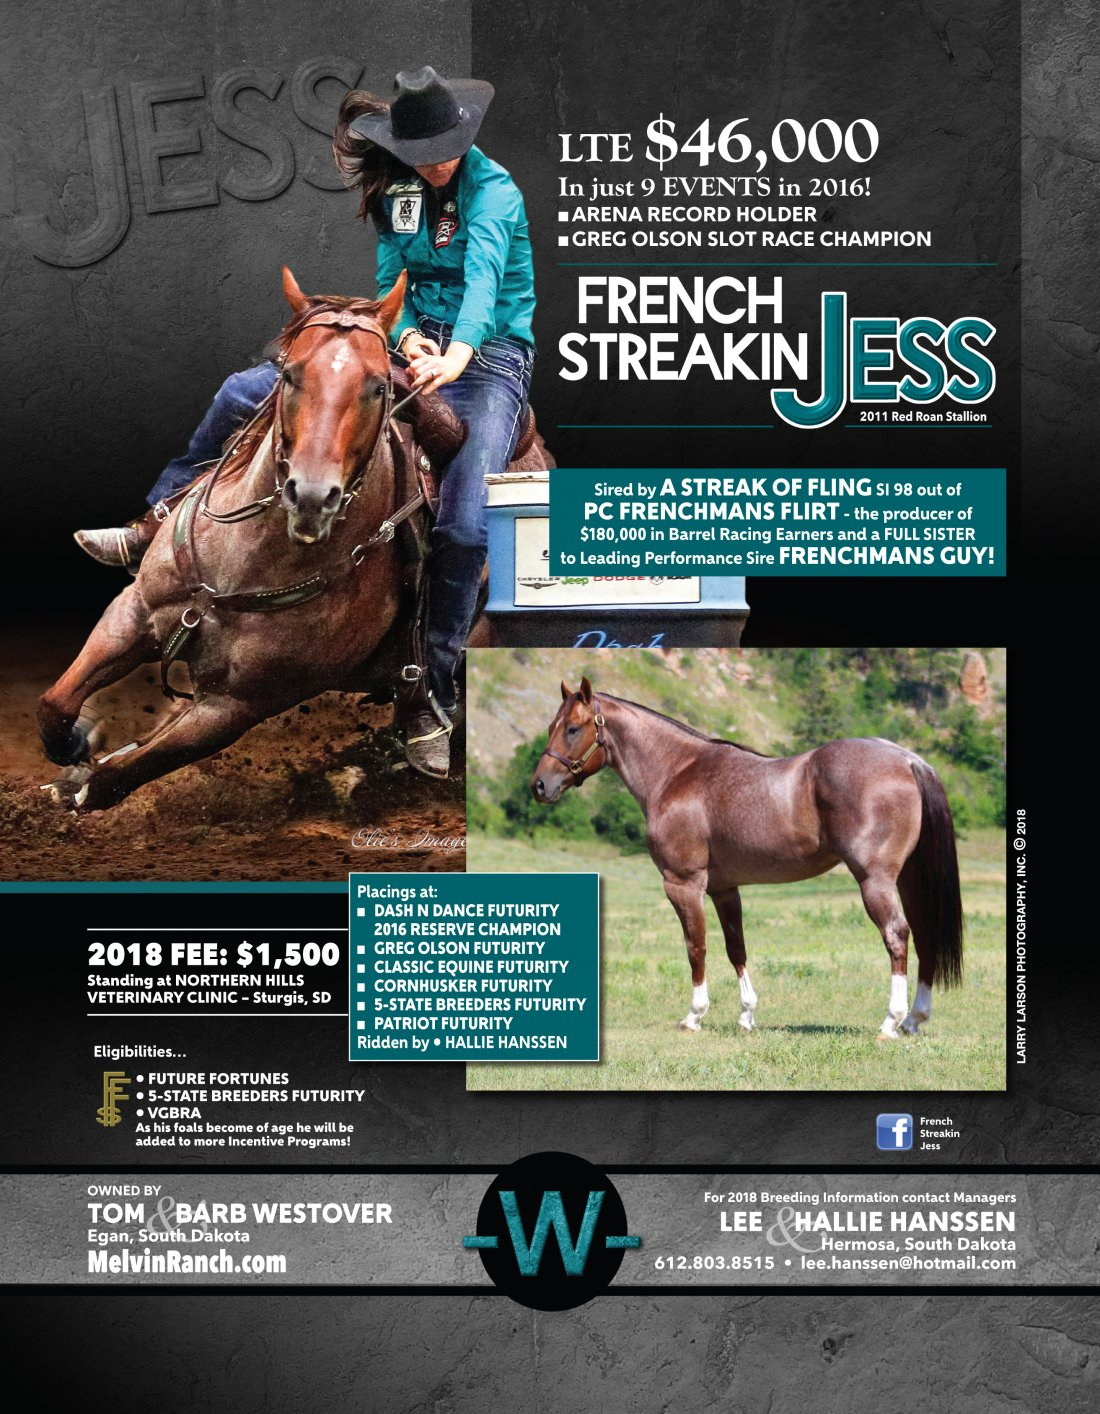 FRENCH STREAKIN JESS